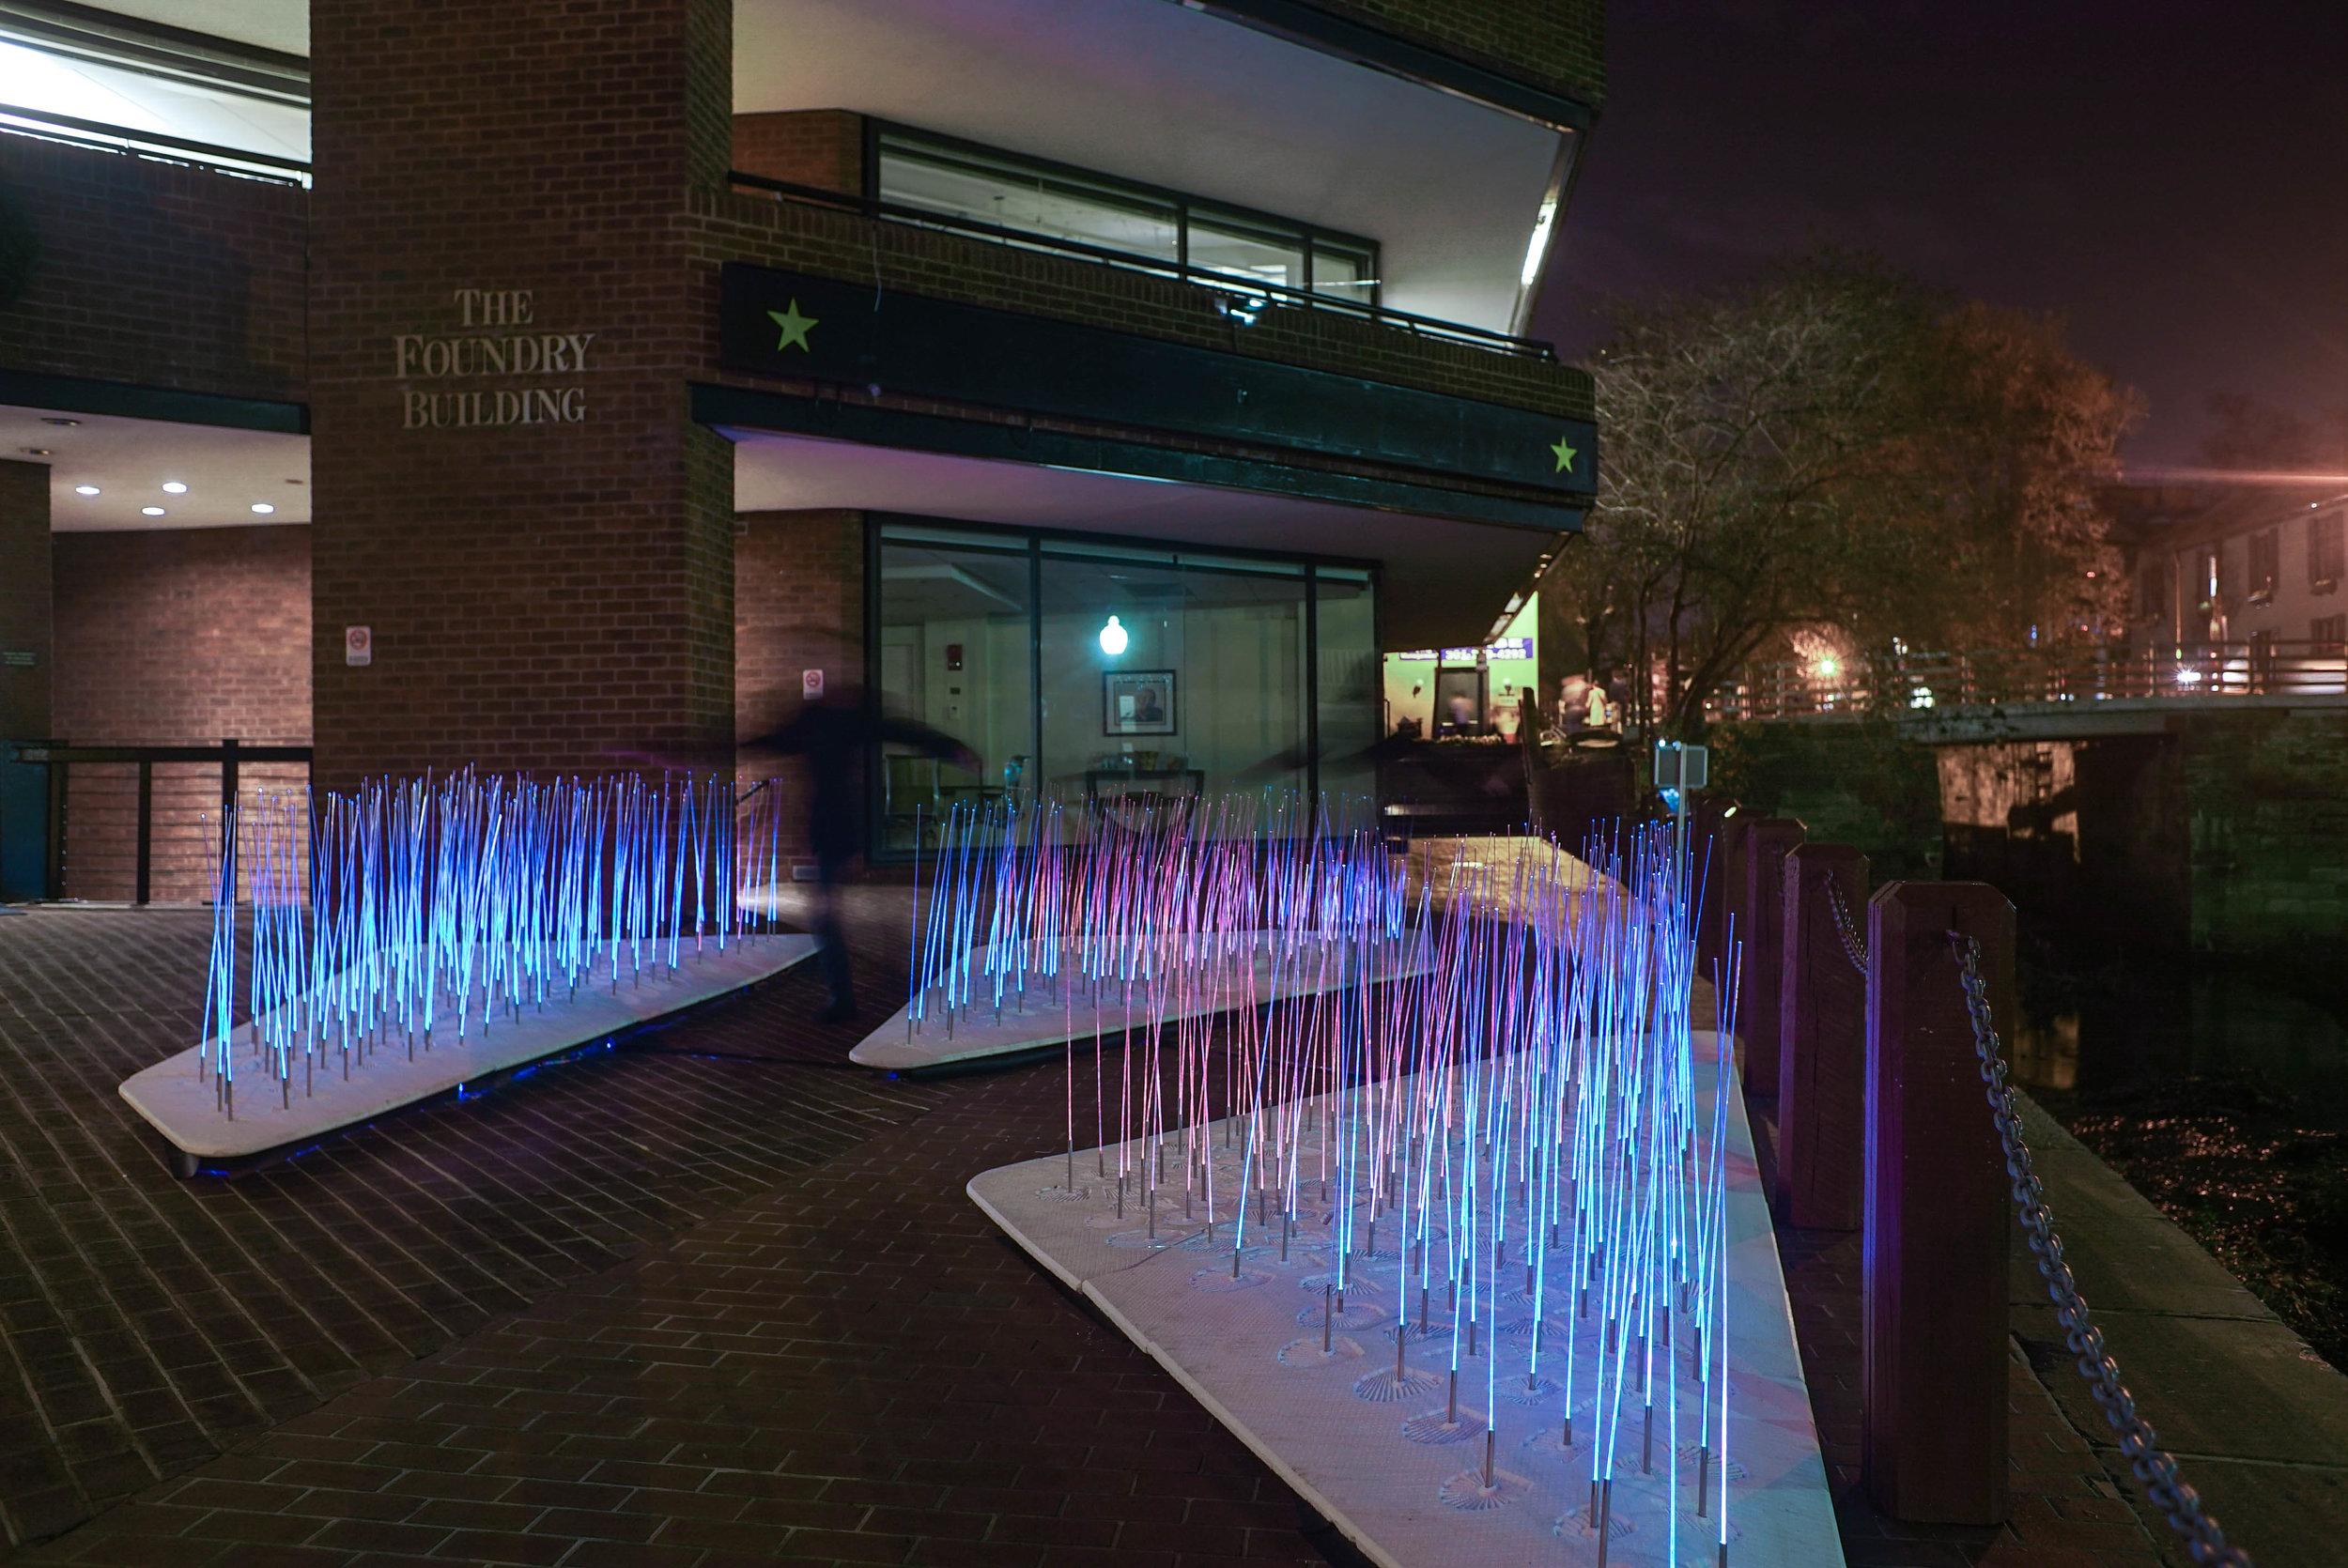 Installation view in Georgetown.